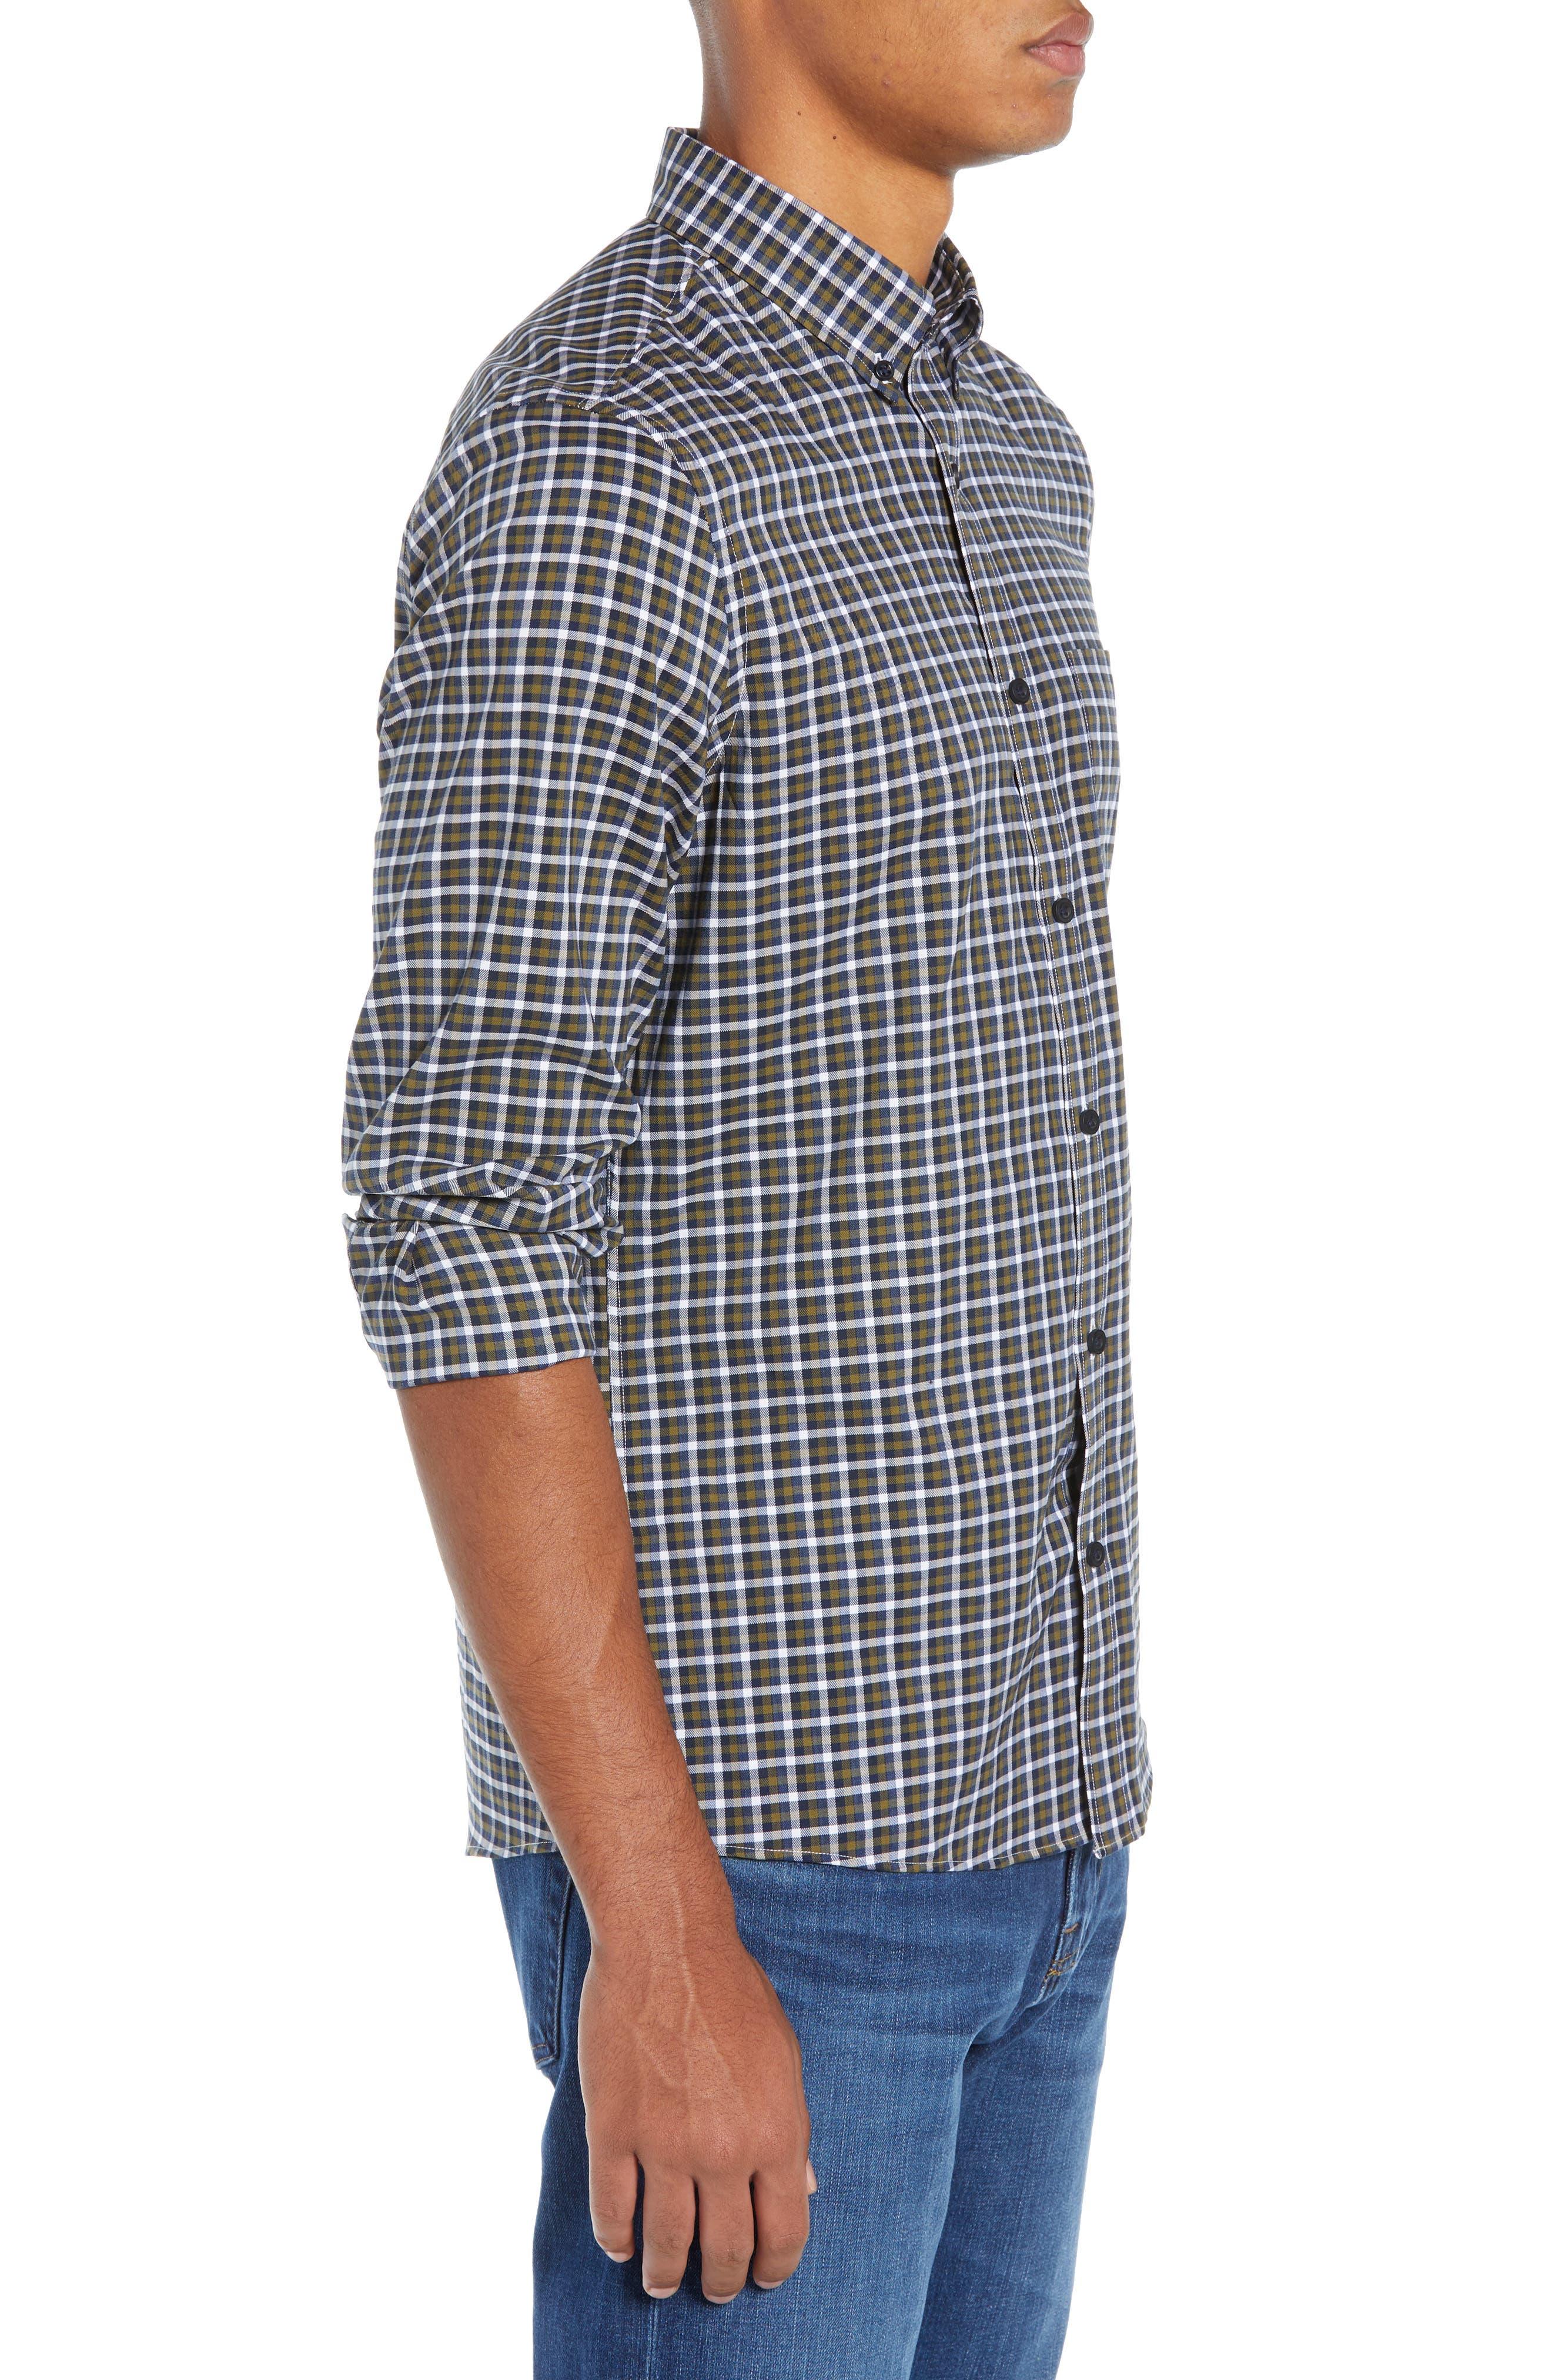 Tech-Smart Slim Fit Check Sport Shirt,                             Alternate thumbnail 4, color,                             NAVY NIGHT OLIVE CHECK